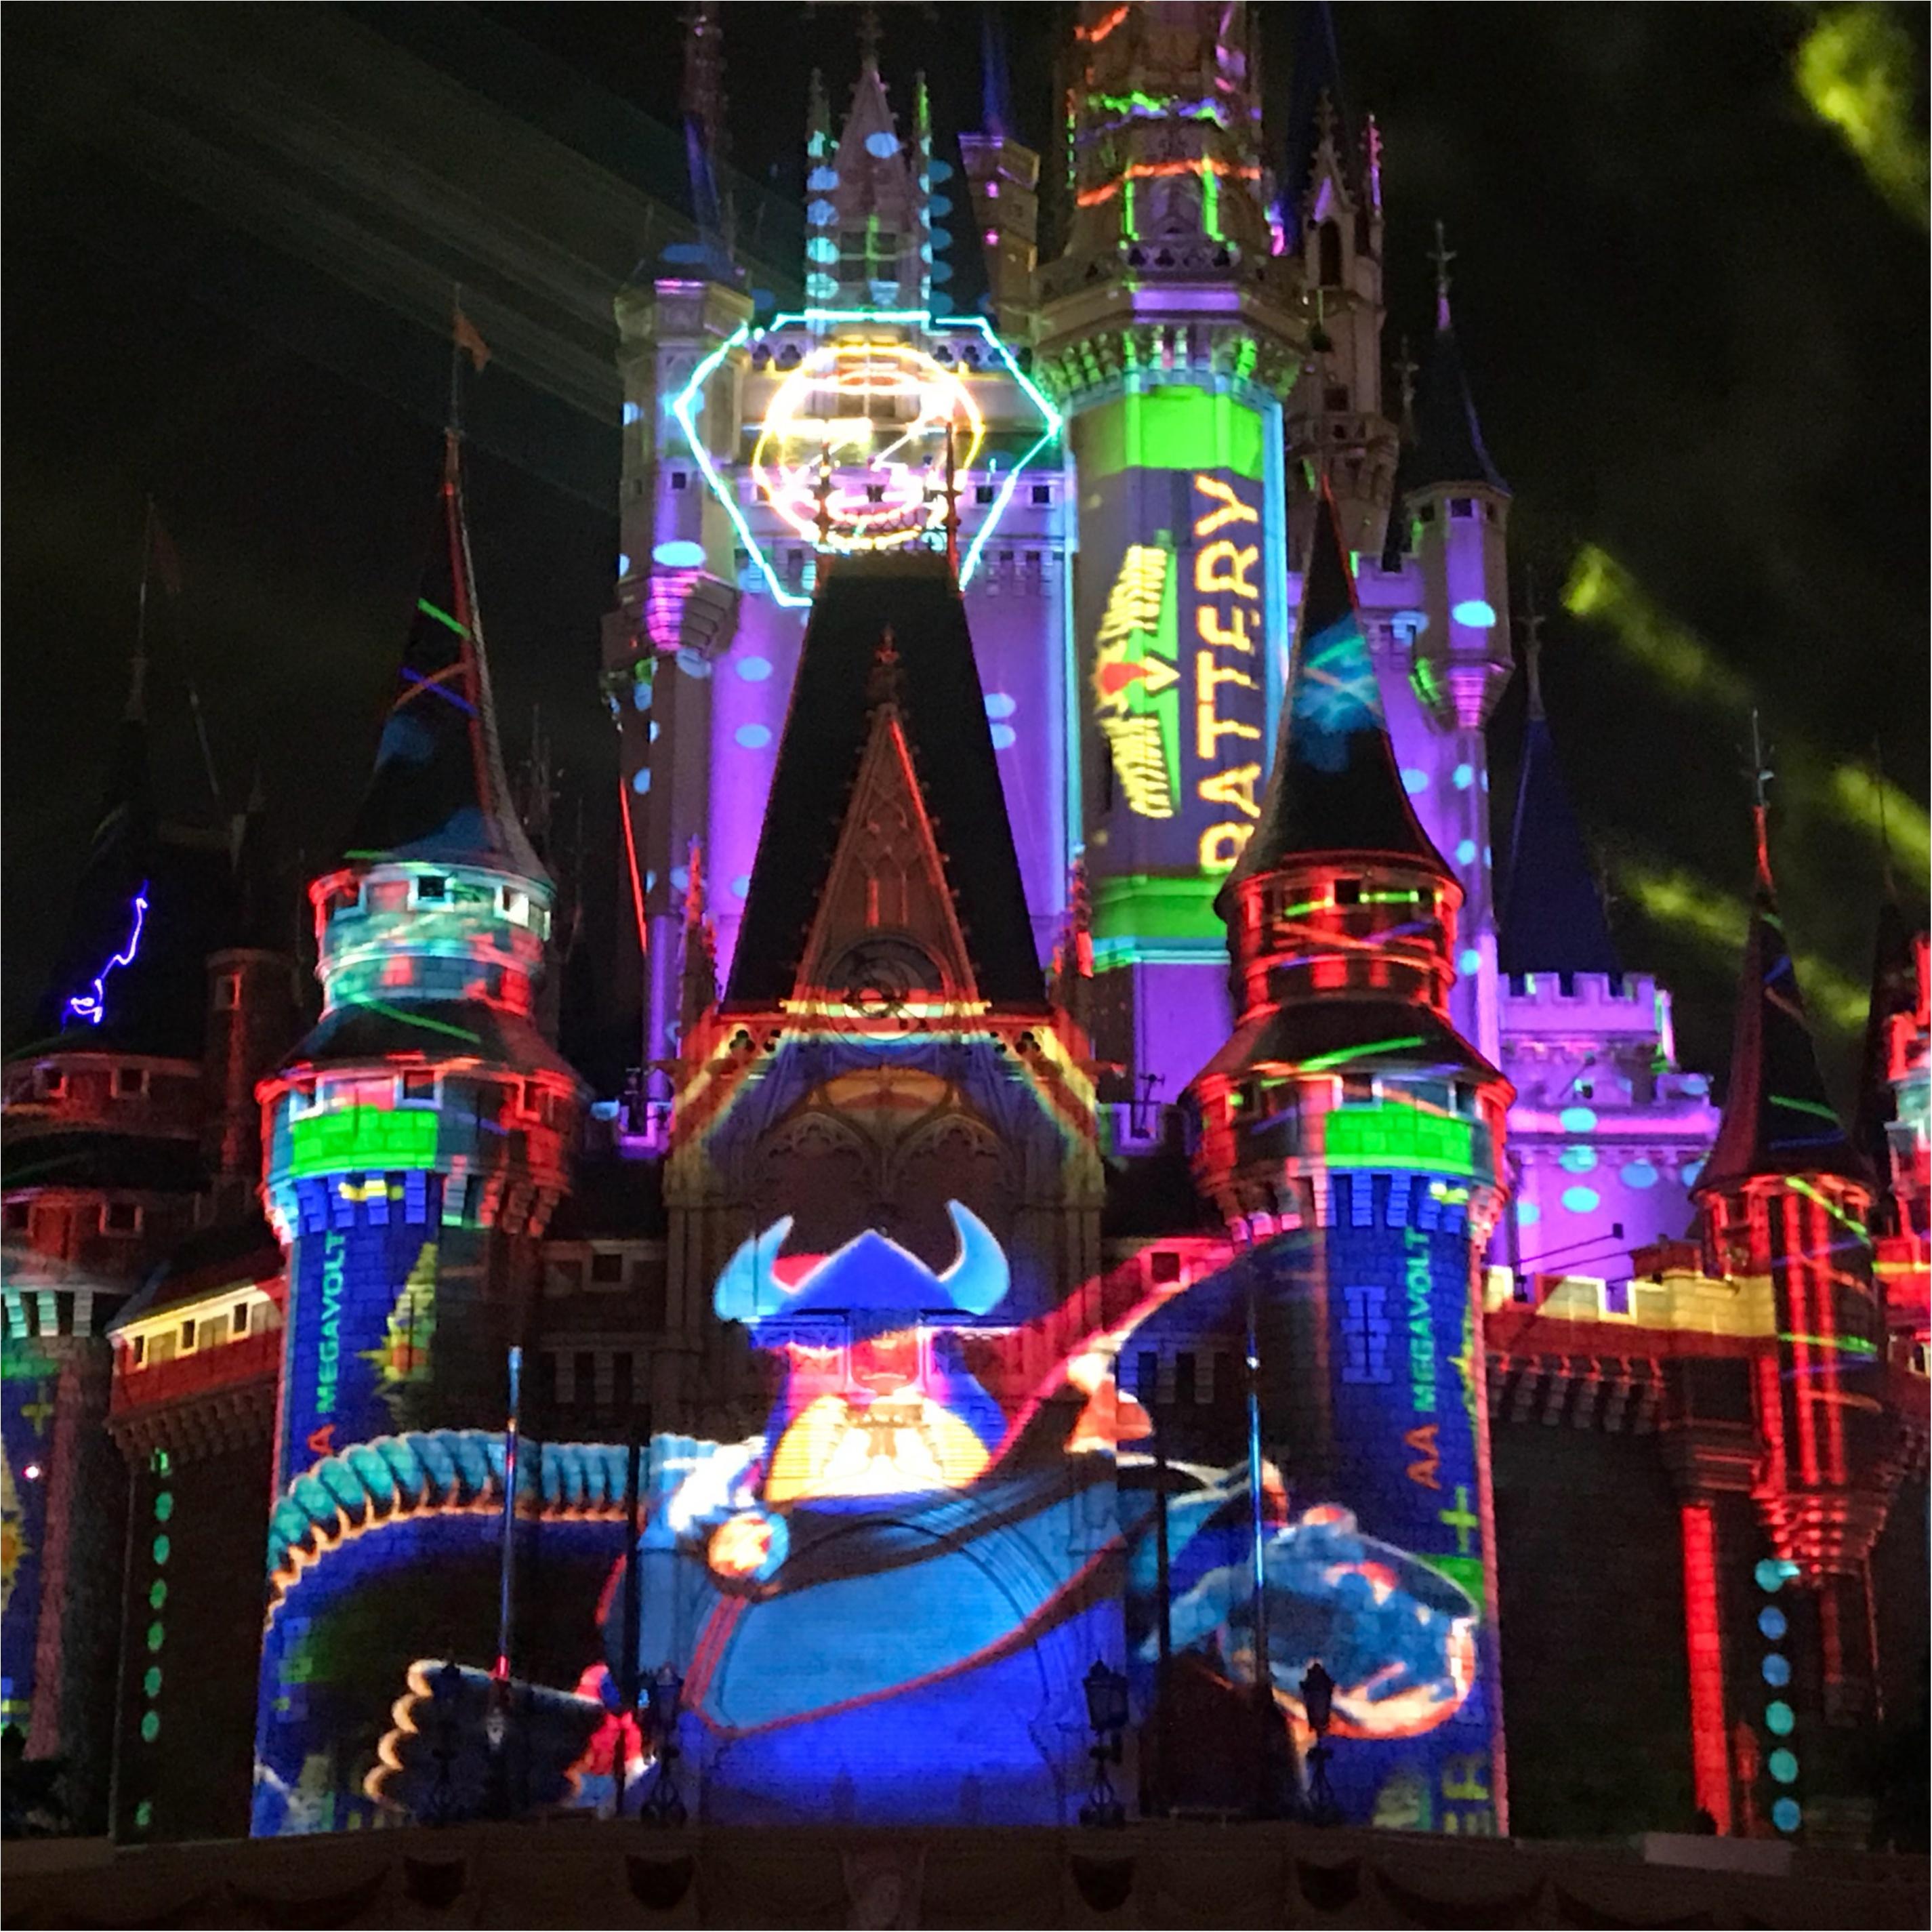 【Celebrate!Tokyo Disneyland】に当選したら絶対に知っておくべきポイントとは❤︎_7